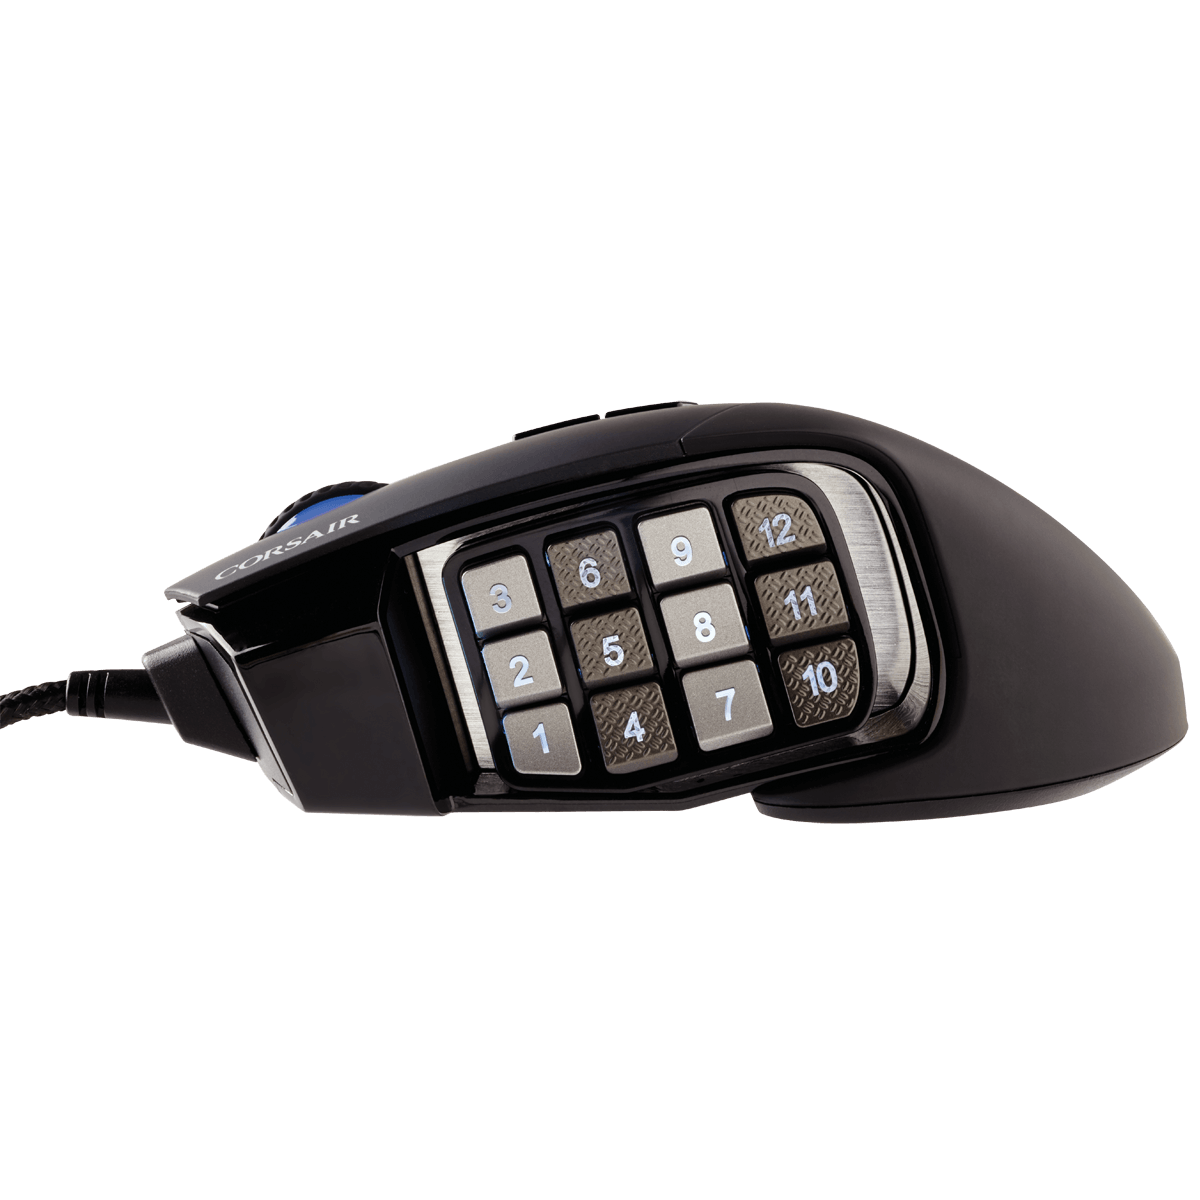 Mouse Corsair Scimitar RGB 12000 Dpi Black Ch-9000231-Na